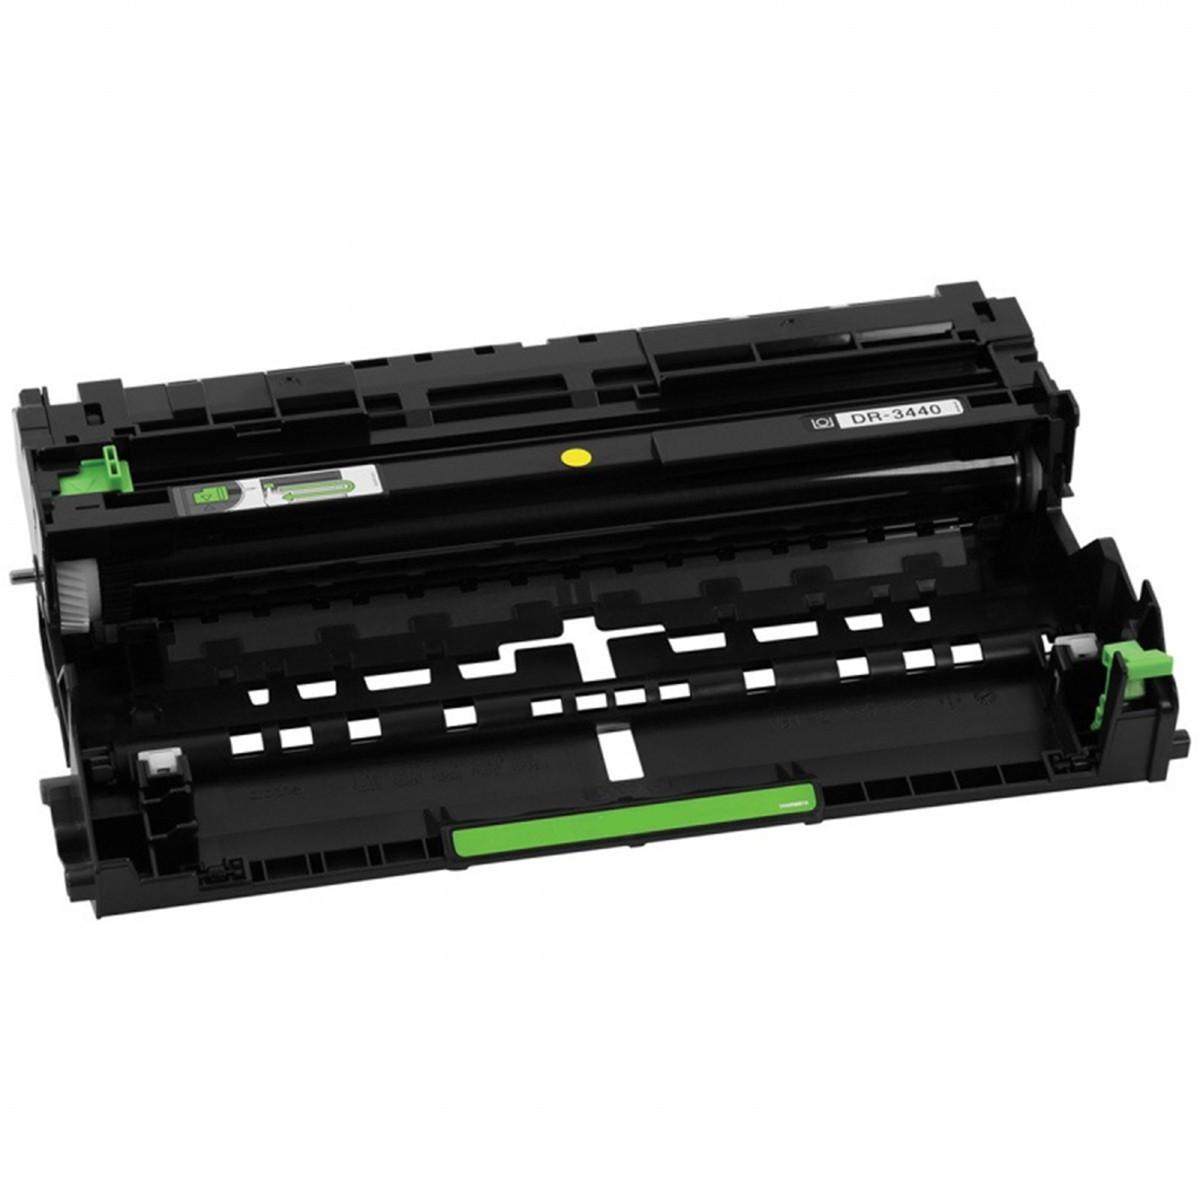 Compativel: Fotocondutor Nacional para  Brother DR3442 3440 3400 DR820 DR3472 L5502DN L5602DN L5702DW L6702DN L5802DW L5902DW 30k